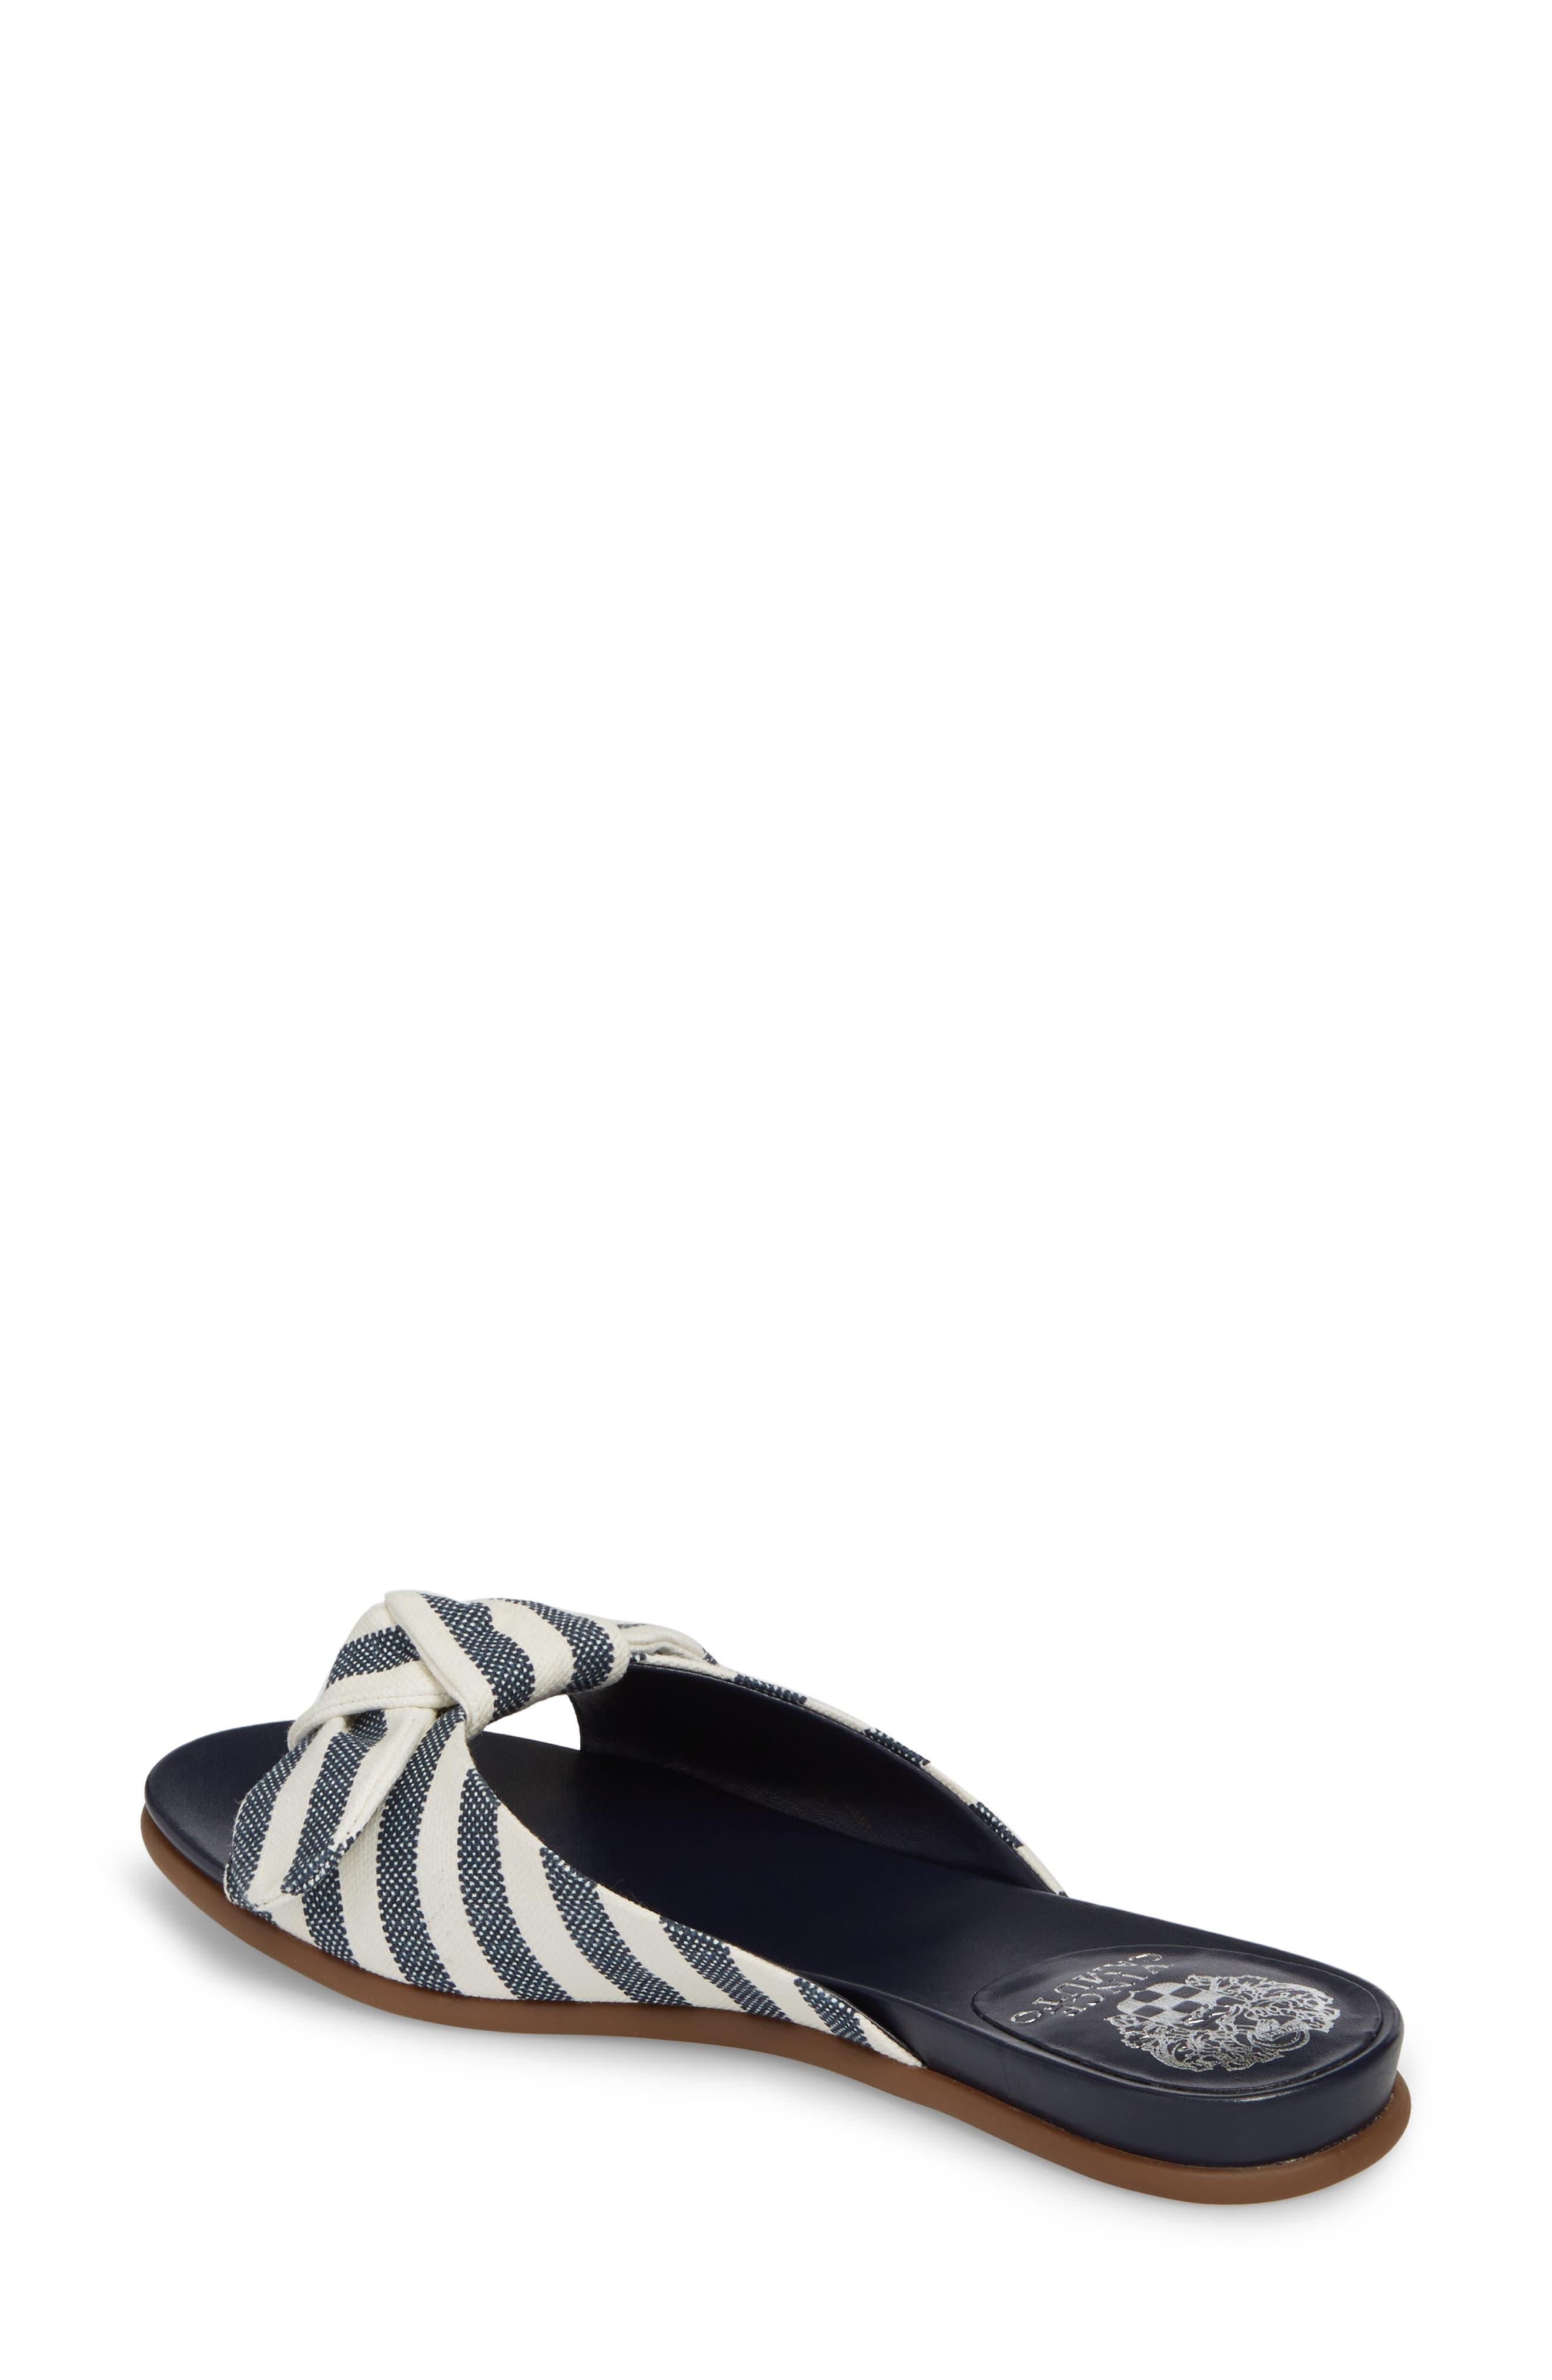 Ejella Slide Sandal,                             Alternate thumbnail 2, color,                             Blue/ Natural Stripe Canvas